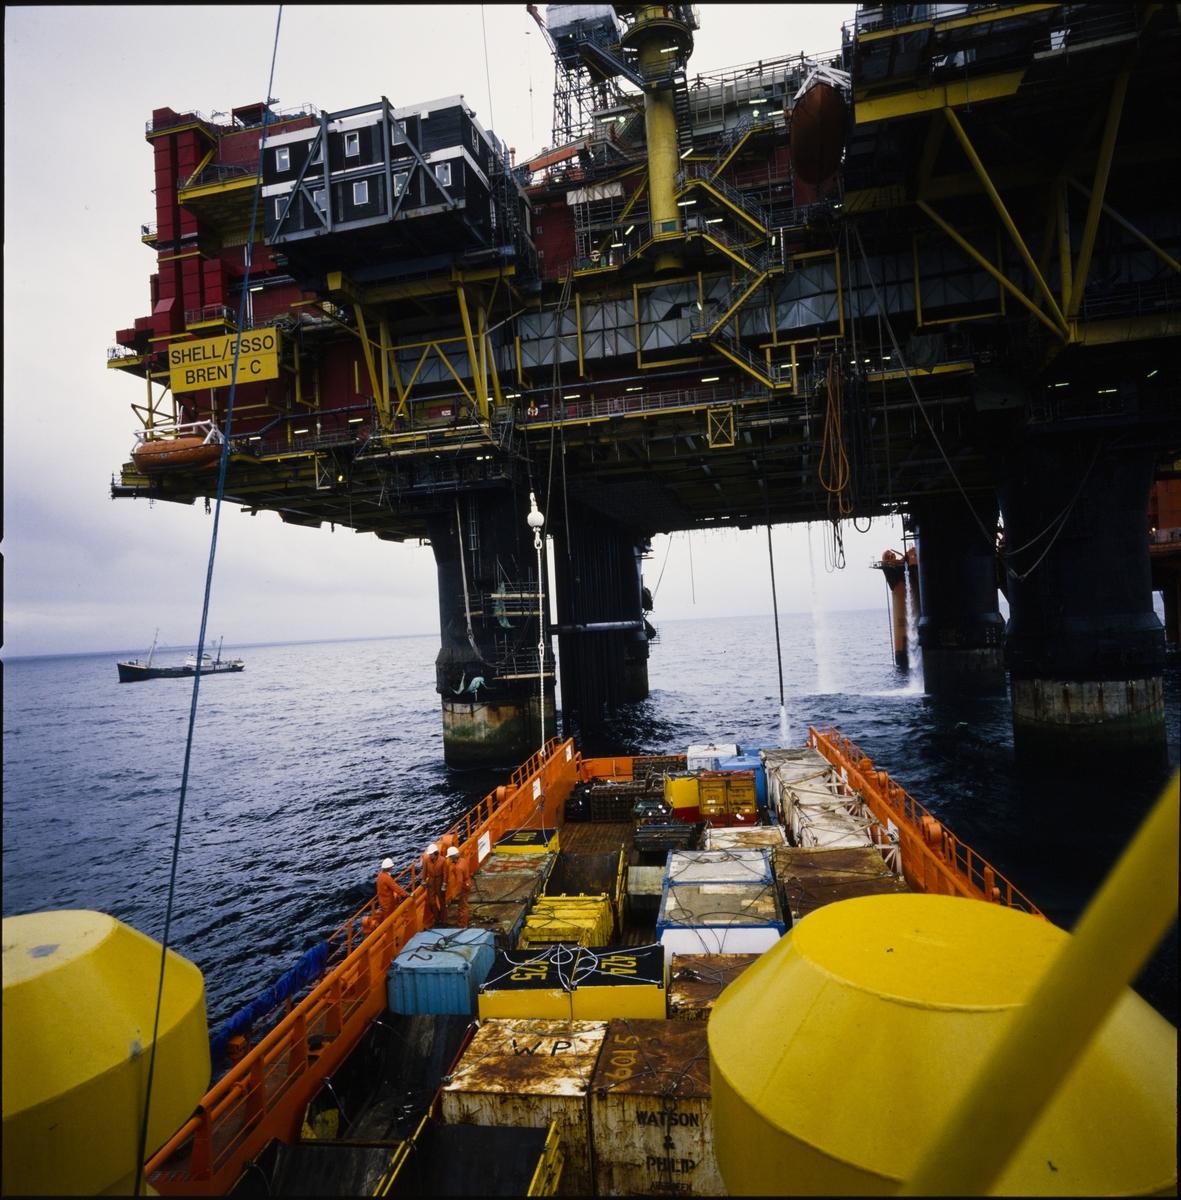 Østensjø rederi sitt plattformskip, Edda Sprite, leverer forsyninger (supply) til Brent-C plattformen til Shell og Esso.